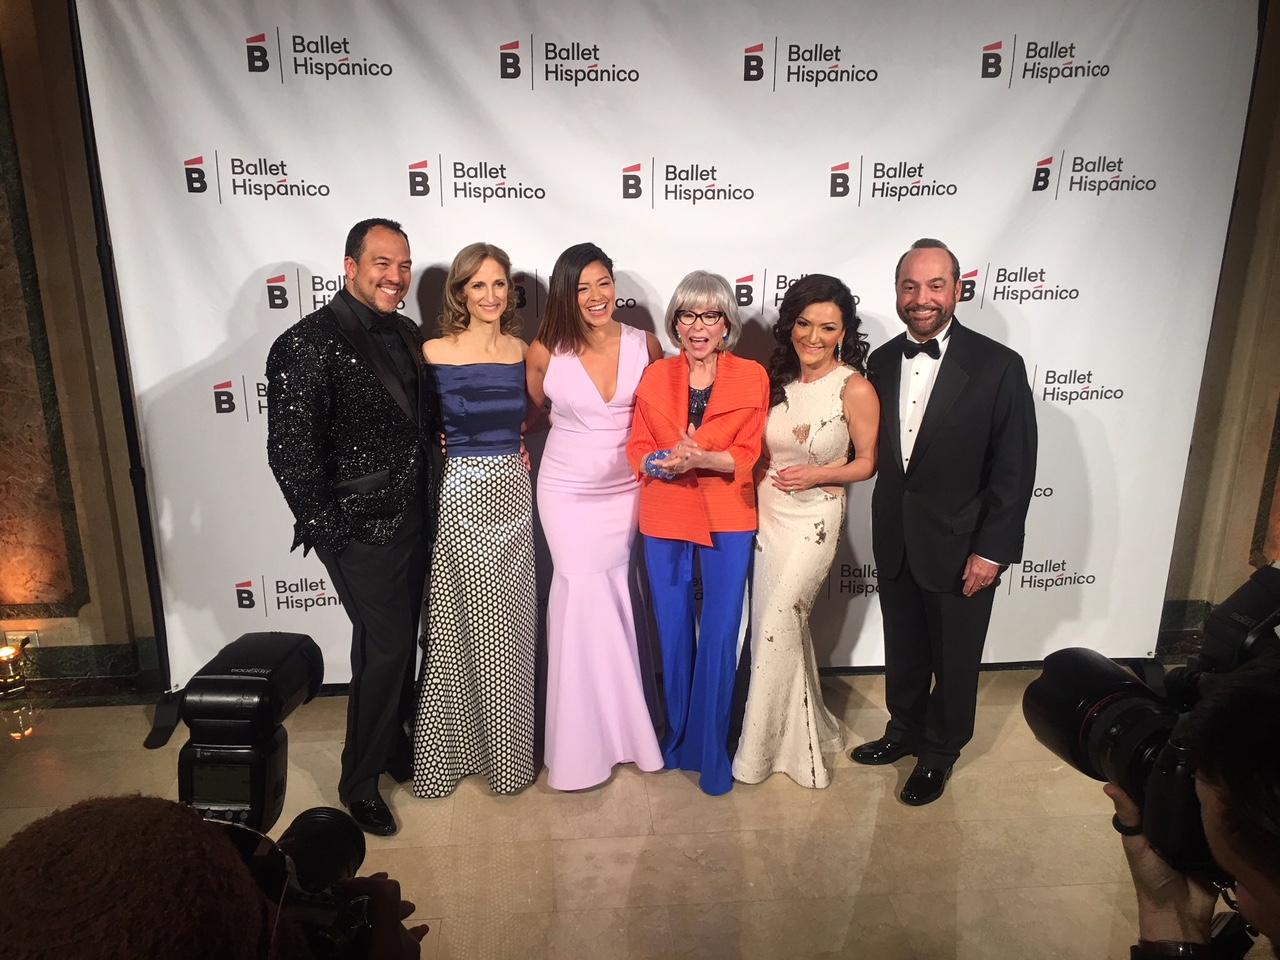 Ralph to Present Award at Ballet Hispánico Carnaval Gala